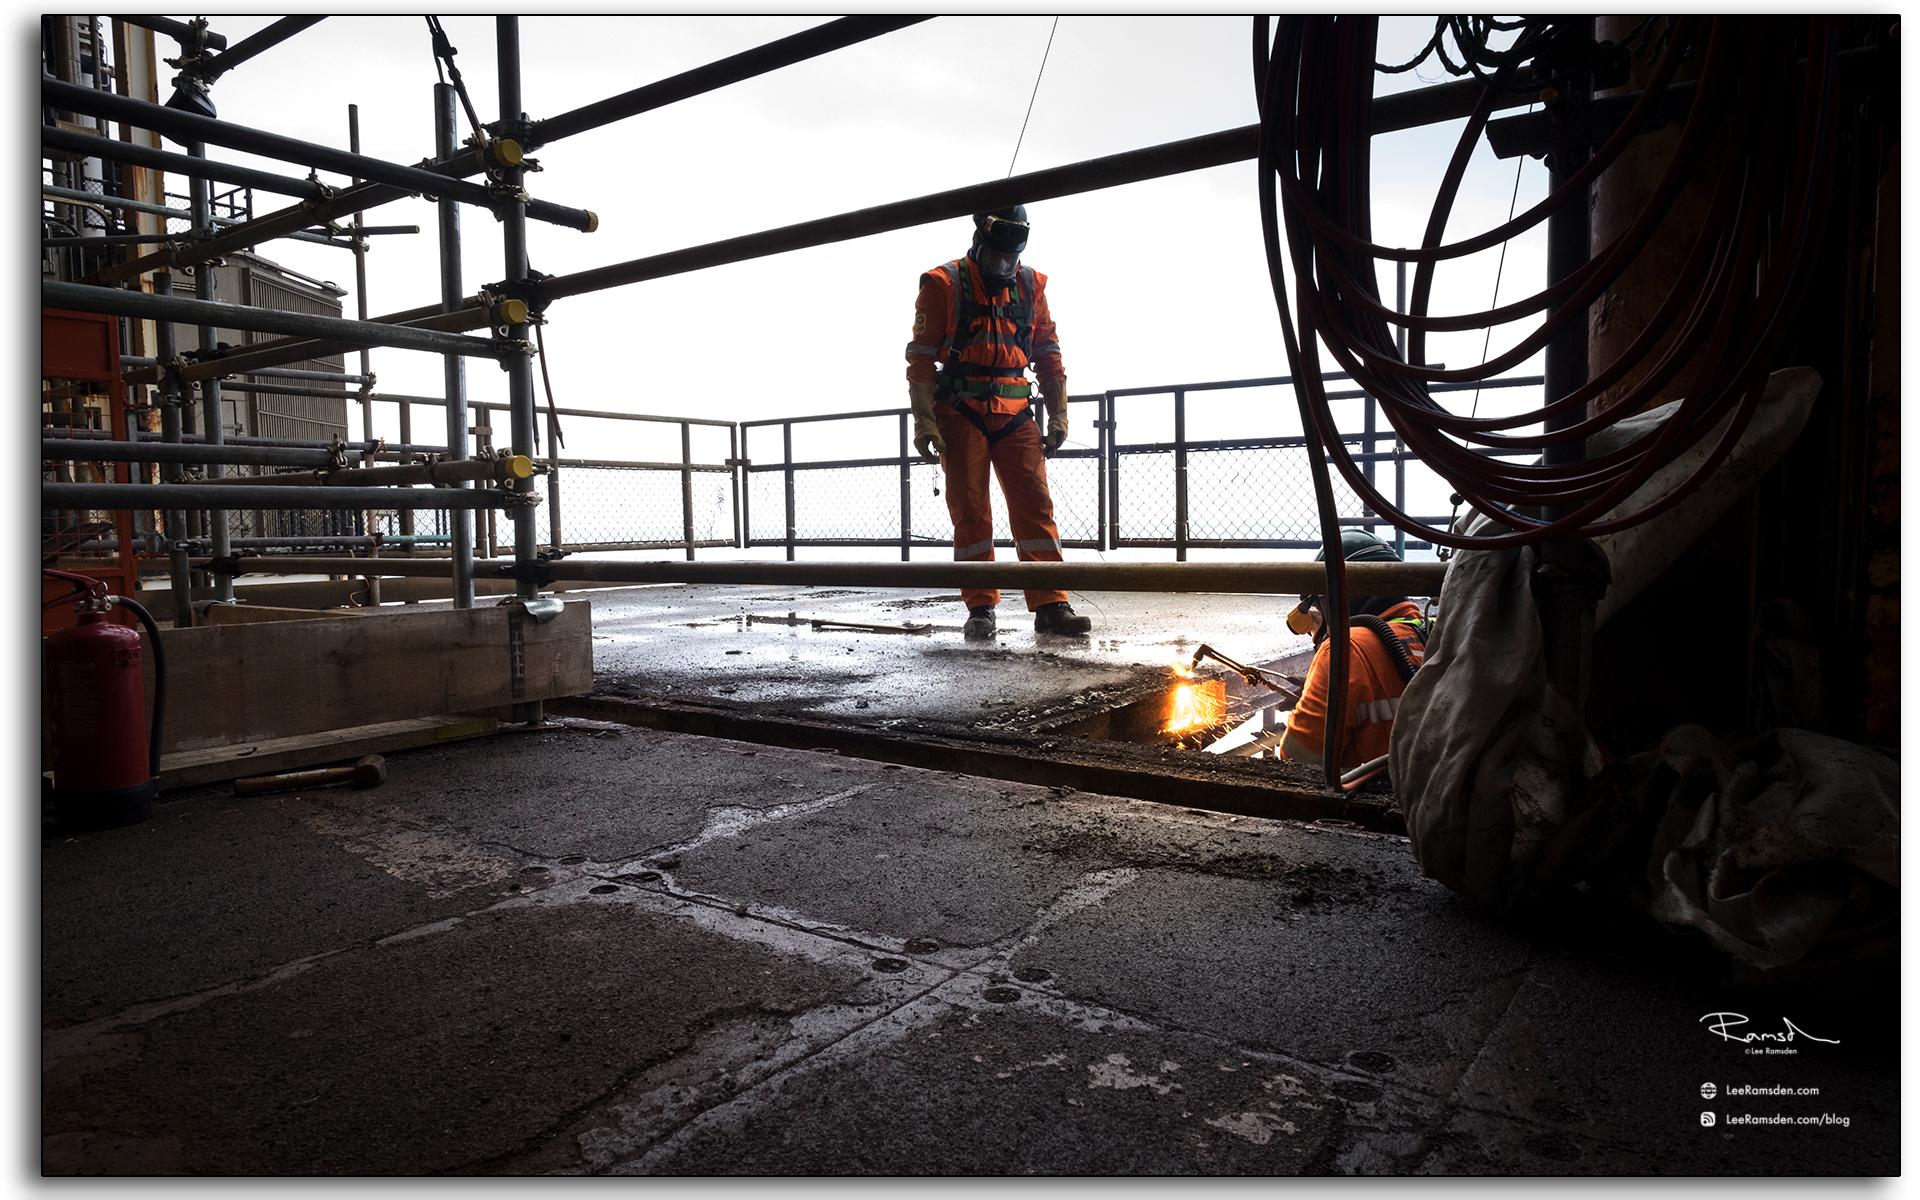 blog, Rig burning, welding, oxygen, acetylene, cutting, BP Miller, Decommissioning, industrial, removal, Saipem, Petrofac, BP, Lee Ramsden, hotwork 02